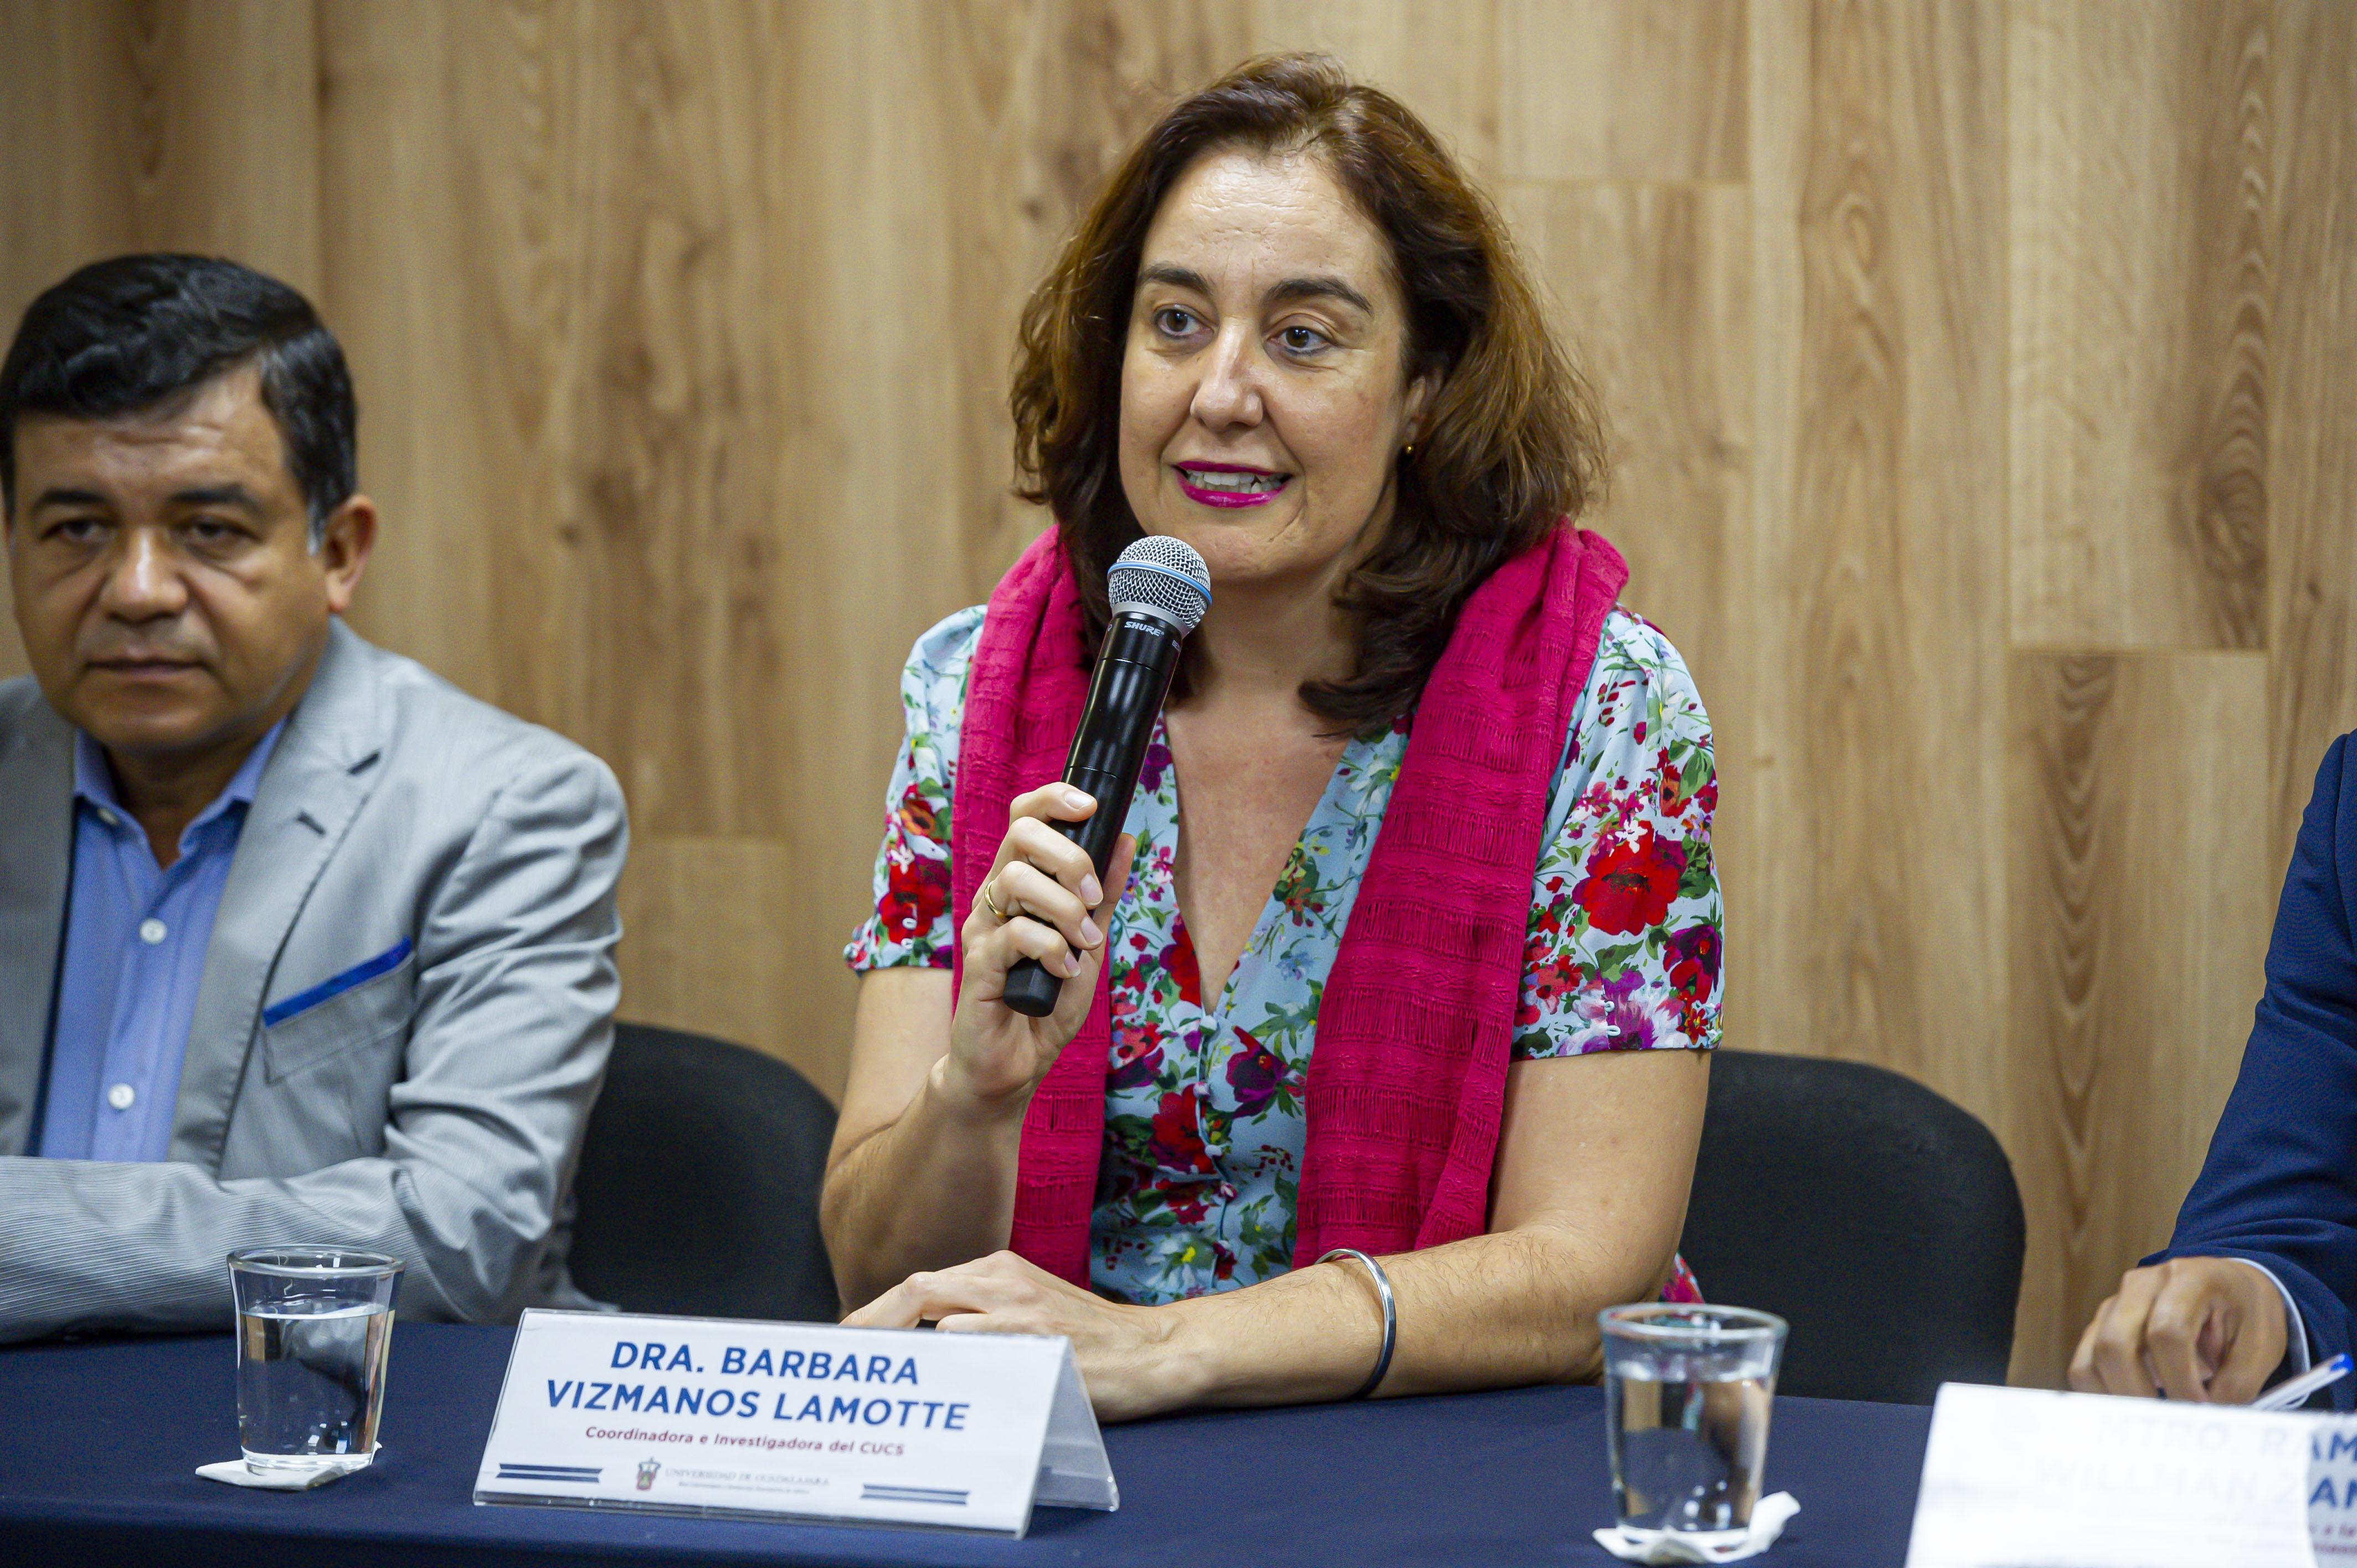 Dra. Barbara Vizmanos haciendo uso de la voz